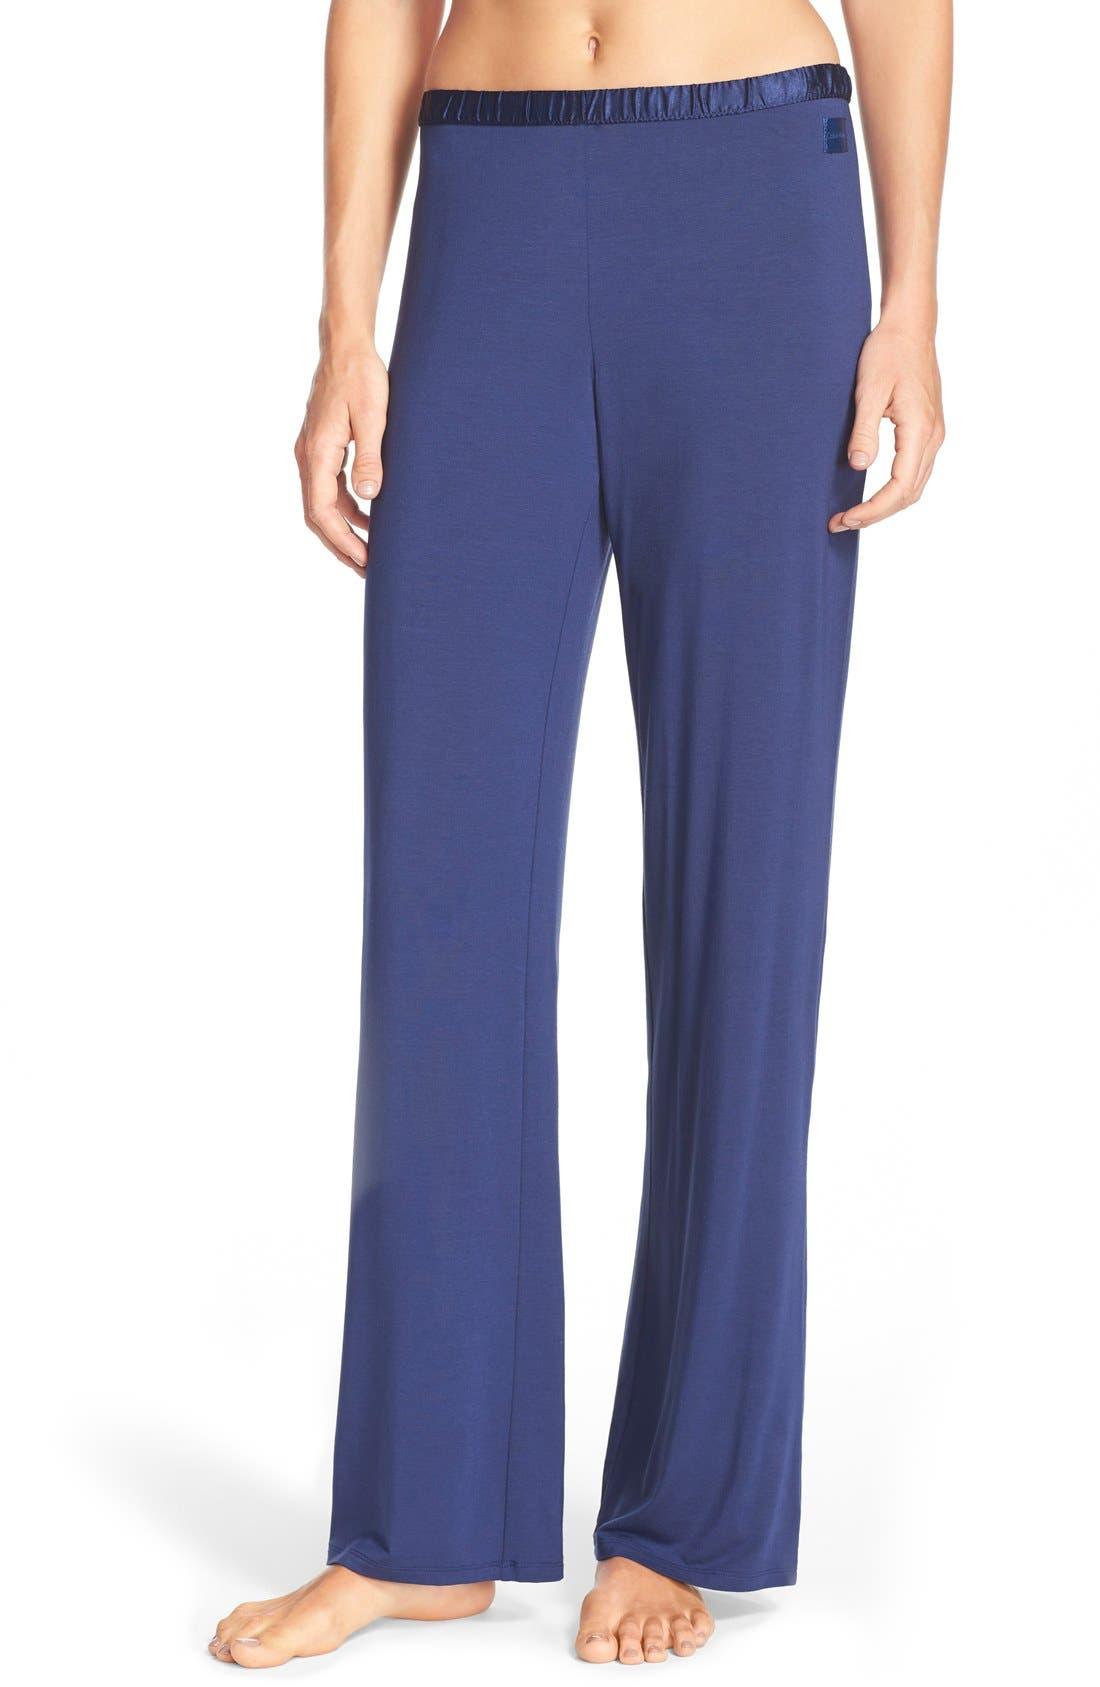 Main Image - Calvin Klein 'Essentials' Satin Waist Pajama Pants